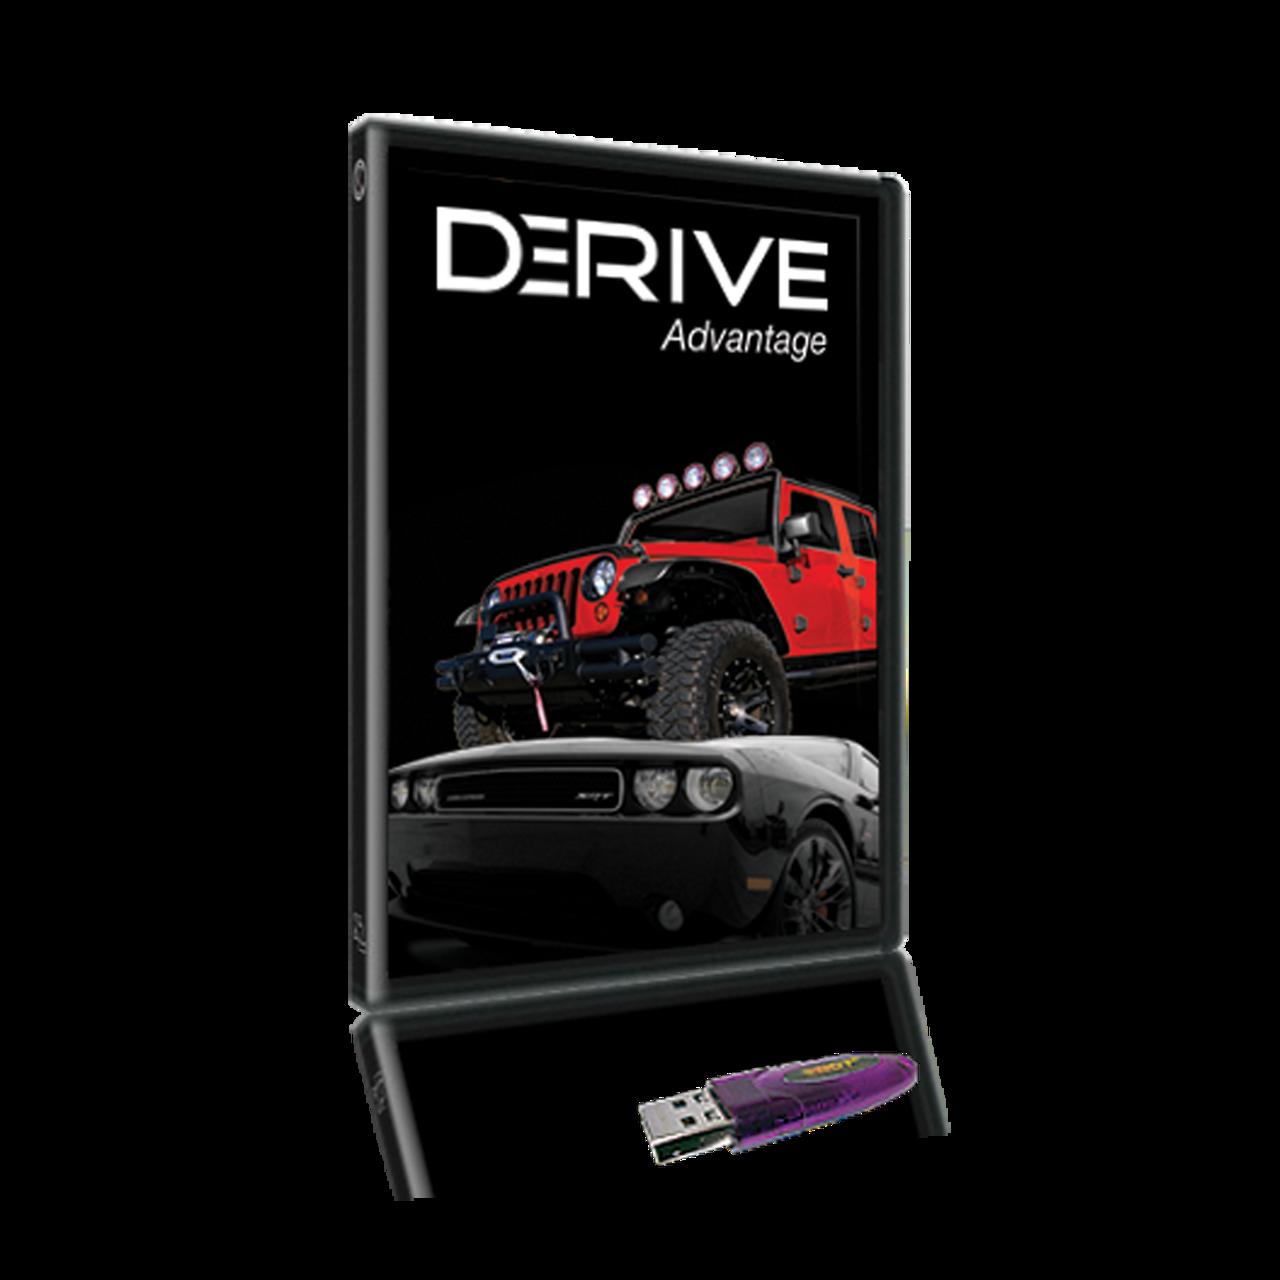 Derive Advantage Tuning Software - Mopar